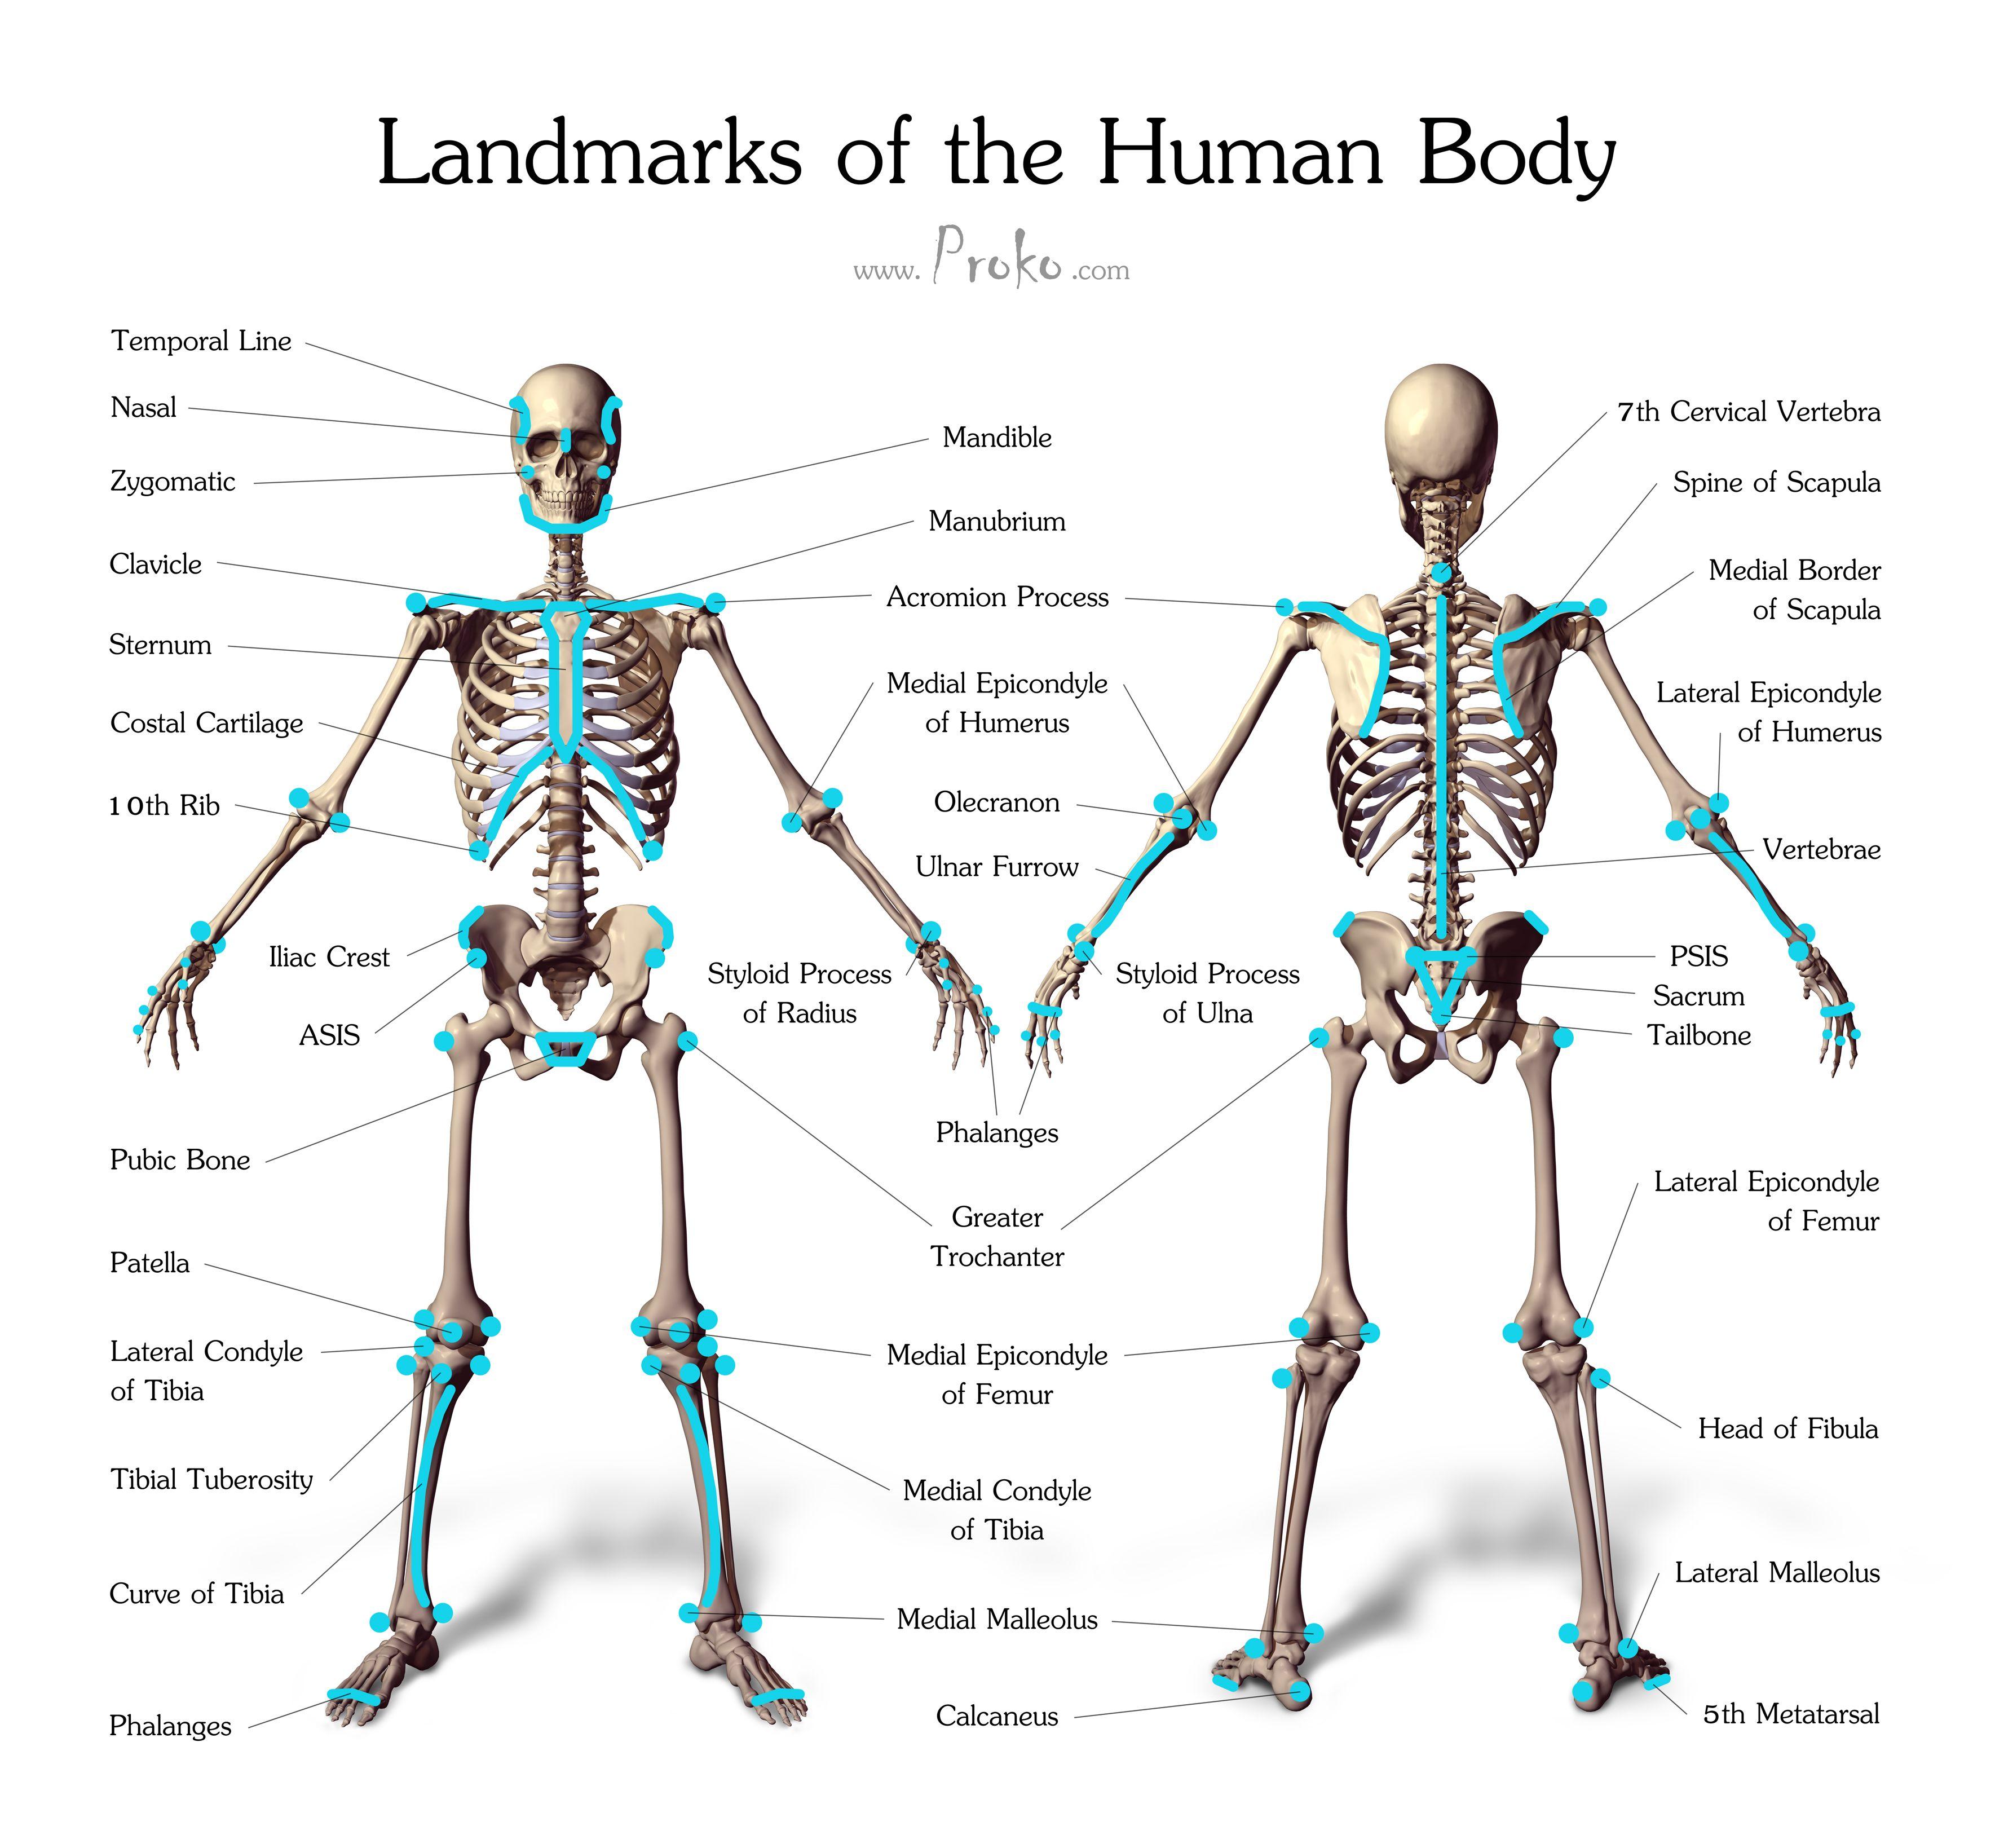 www.proko.com/wp-content/uploads/2013/06/Landmarks-of-the-Human-Body ...